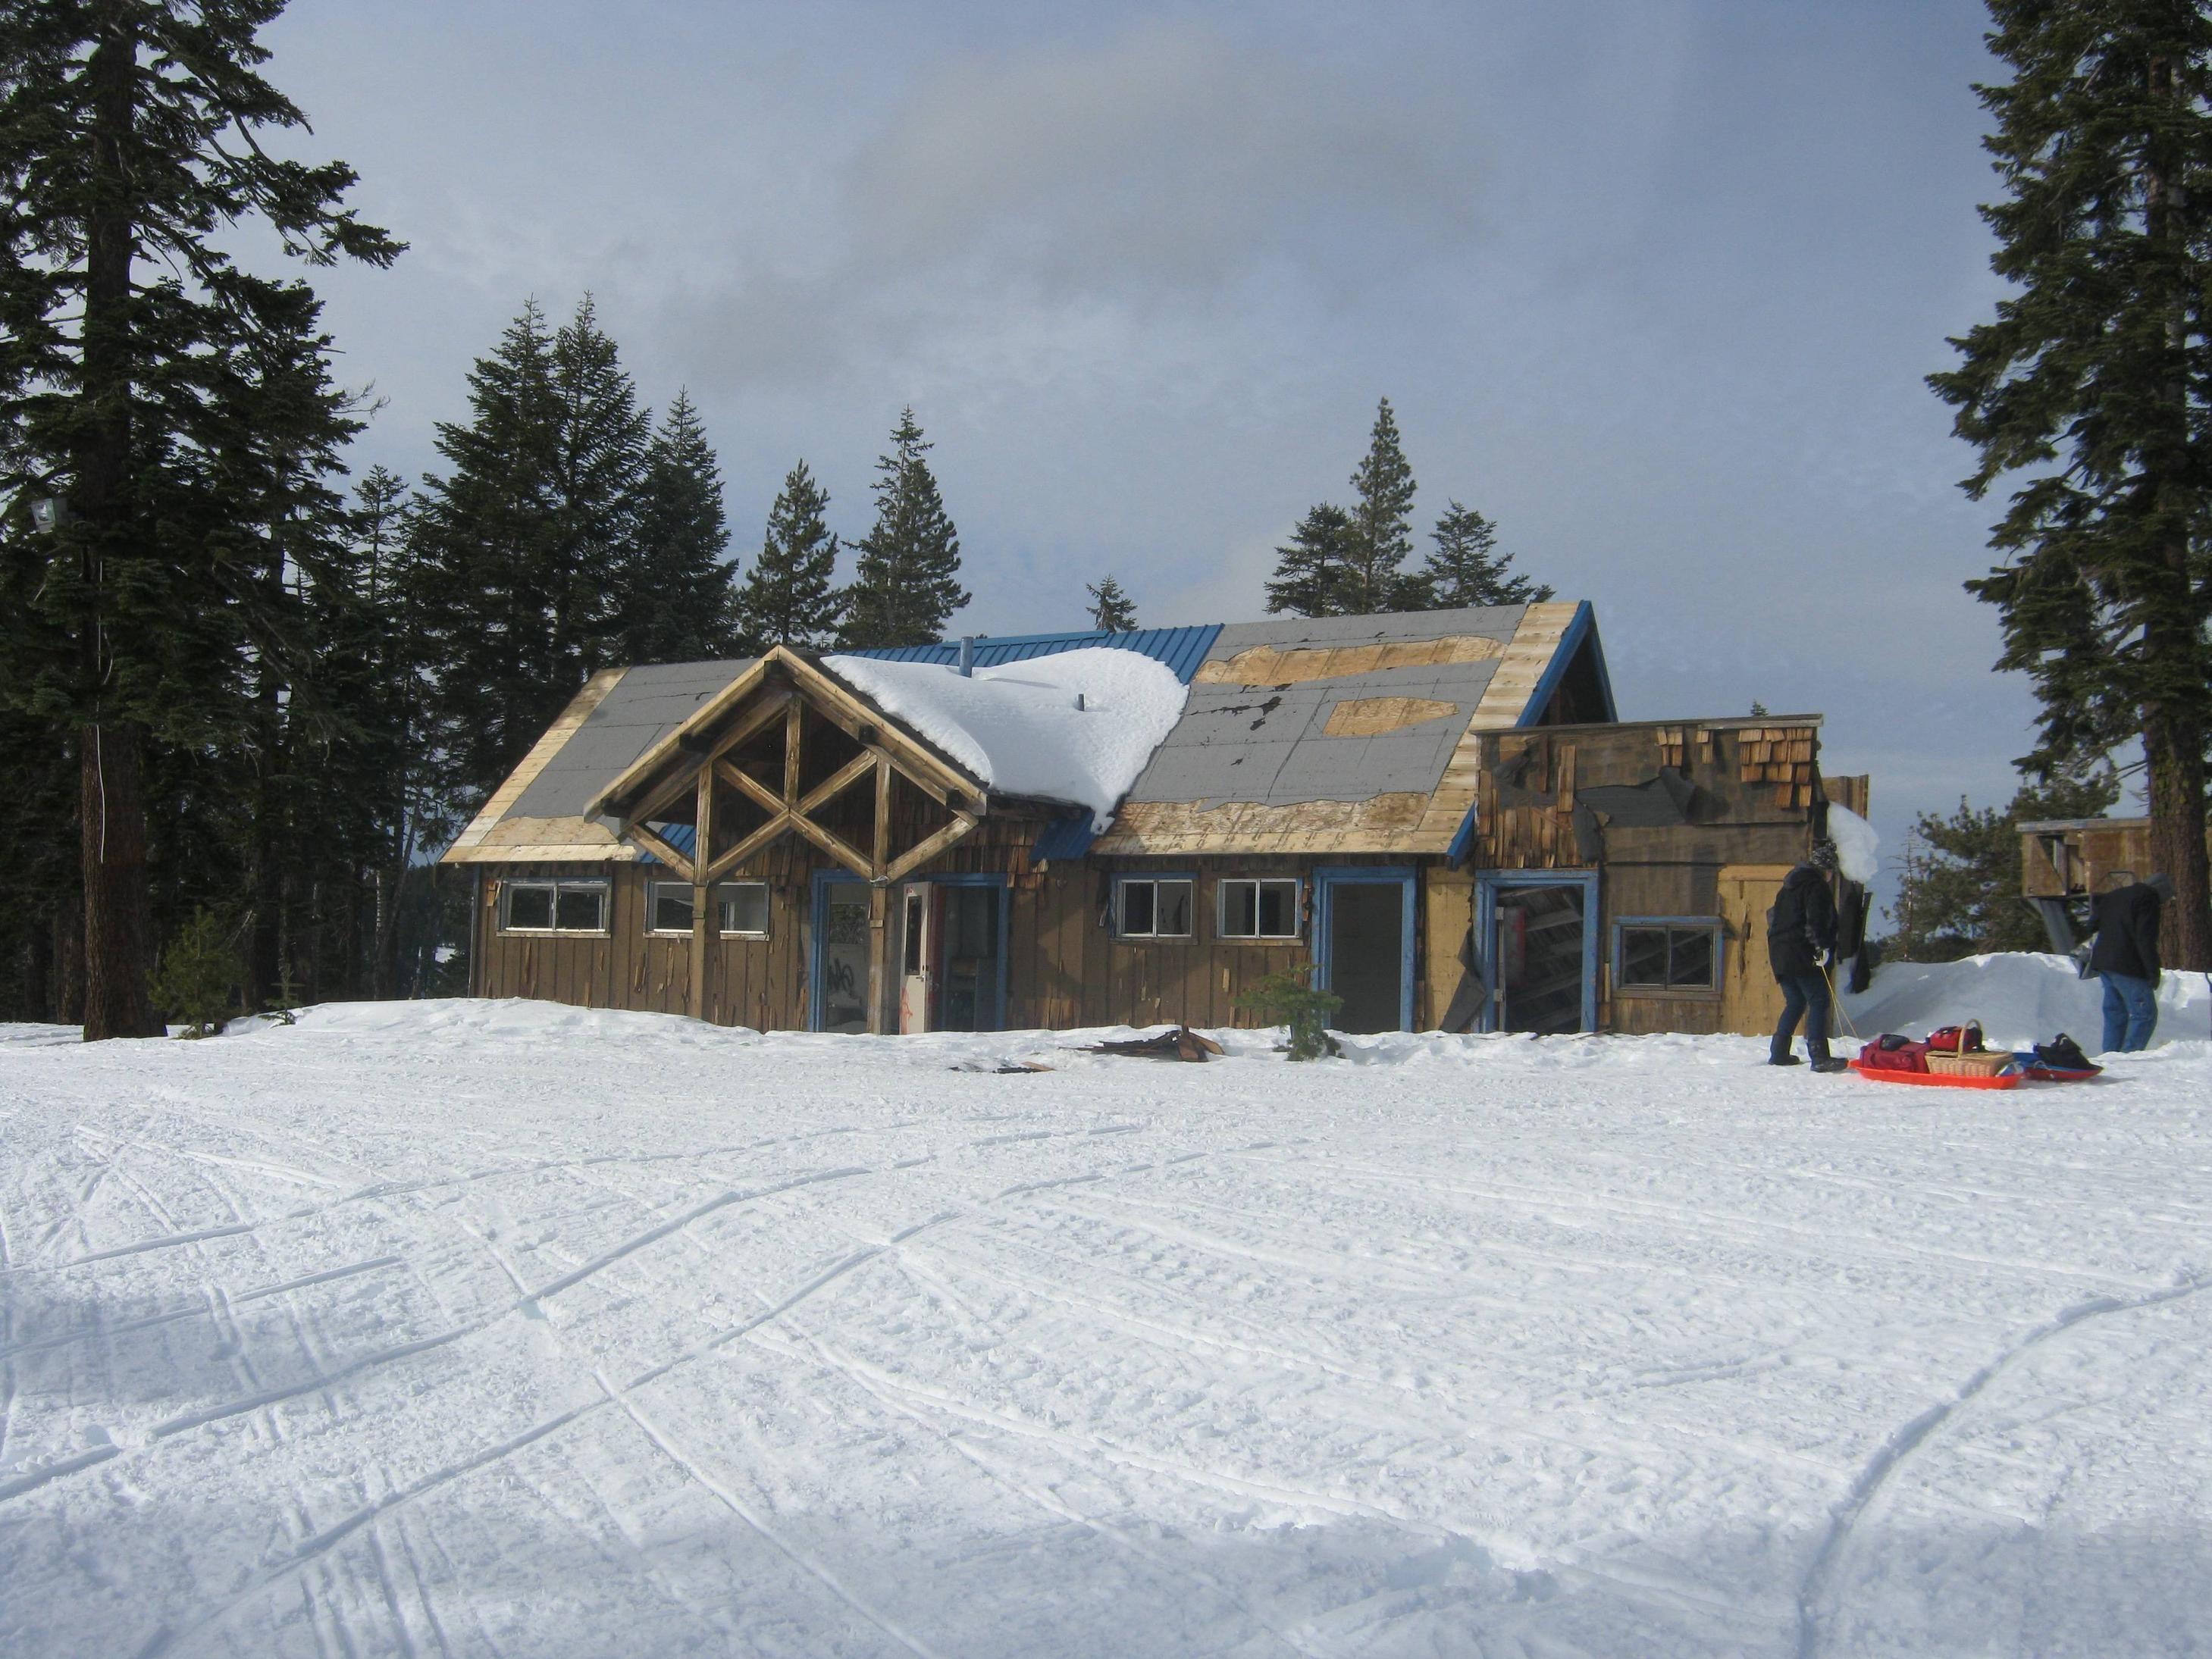 Steamboat Springs Colorado Ski Resort